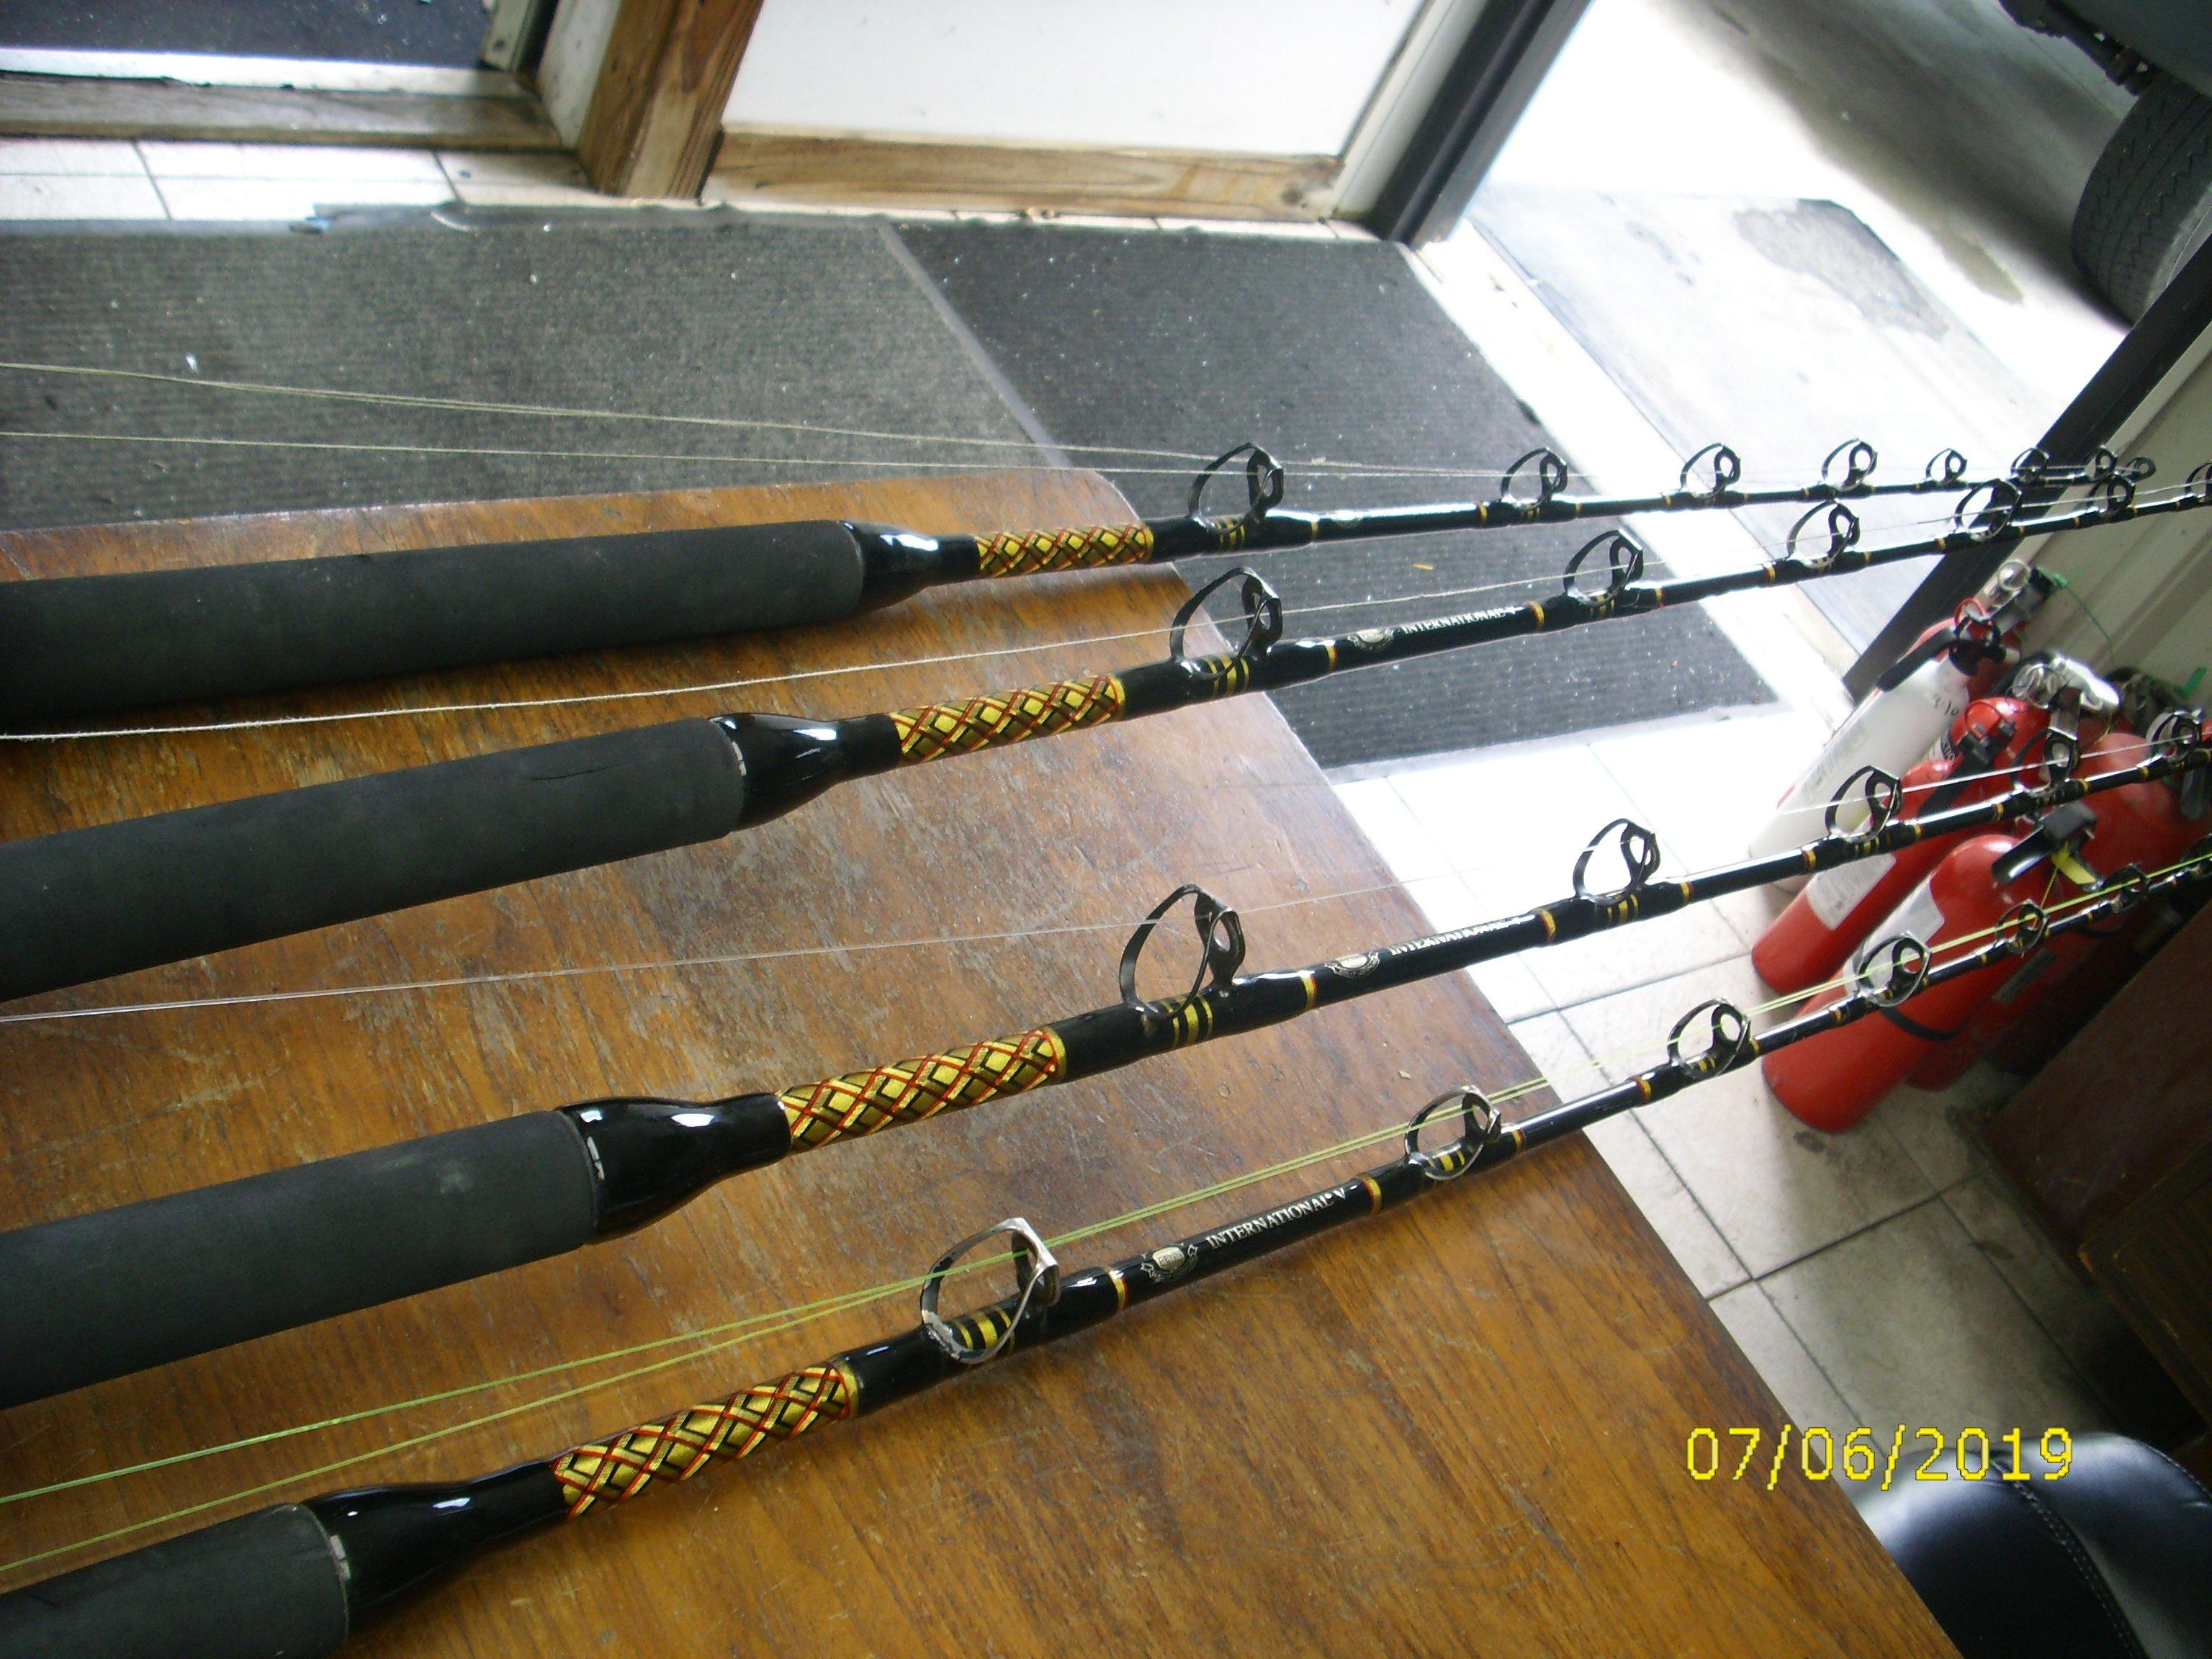 FS: Penn International 30VSX& Penn International rod Matched set of